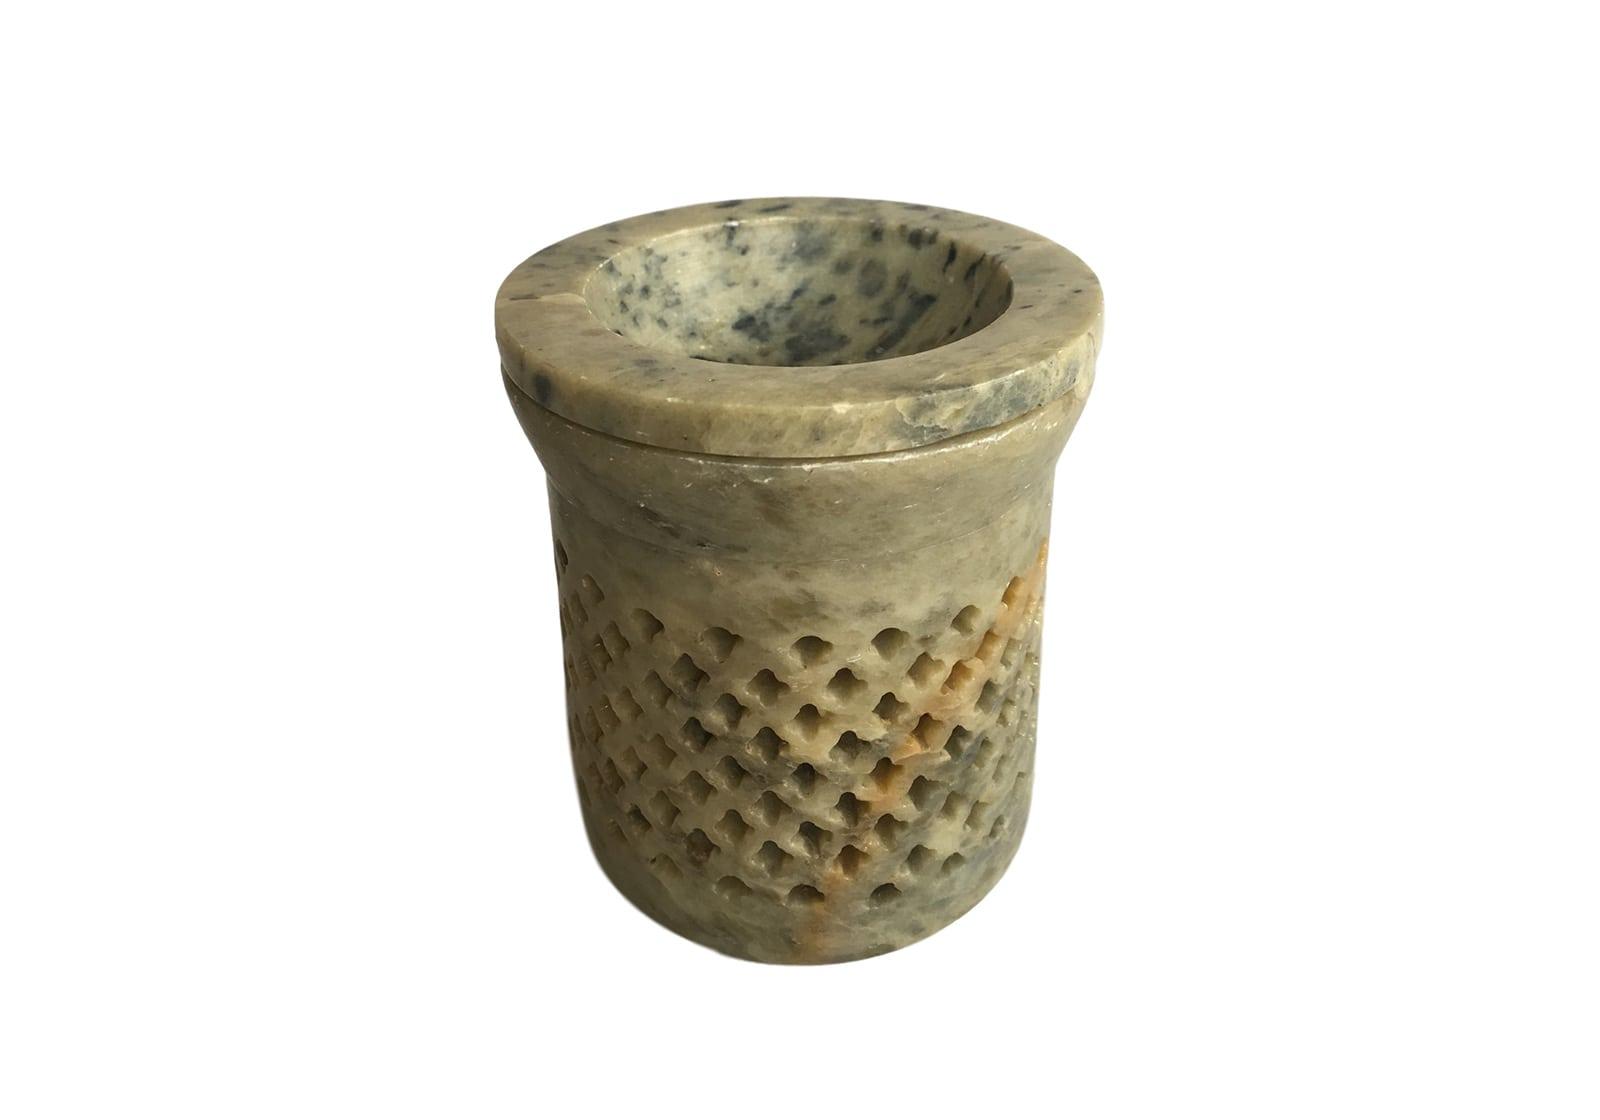 Фото Аромалампа каменная в ромбики 8,5*7*7,5 см Индия (арт.527)